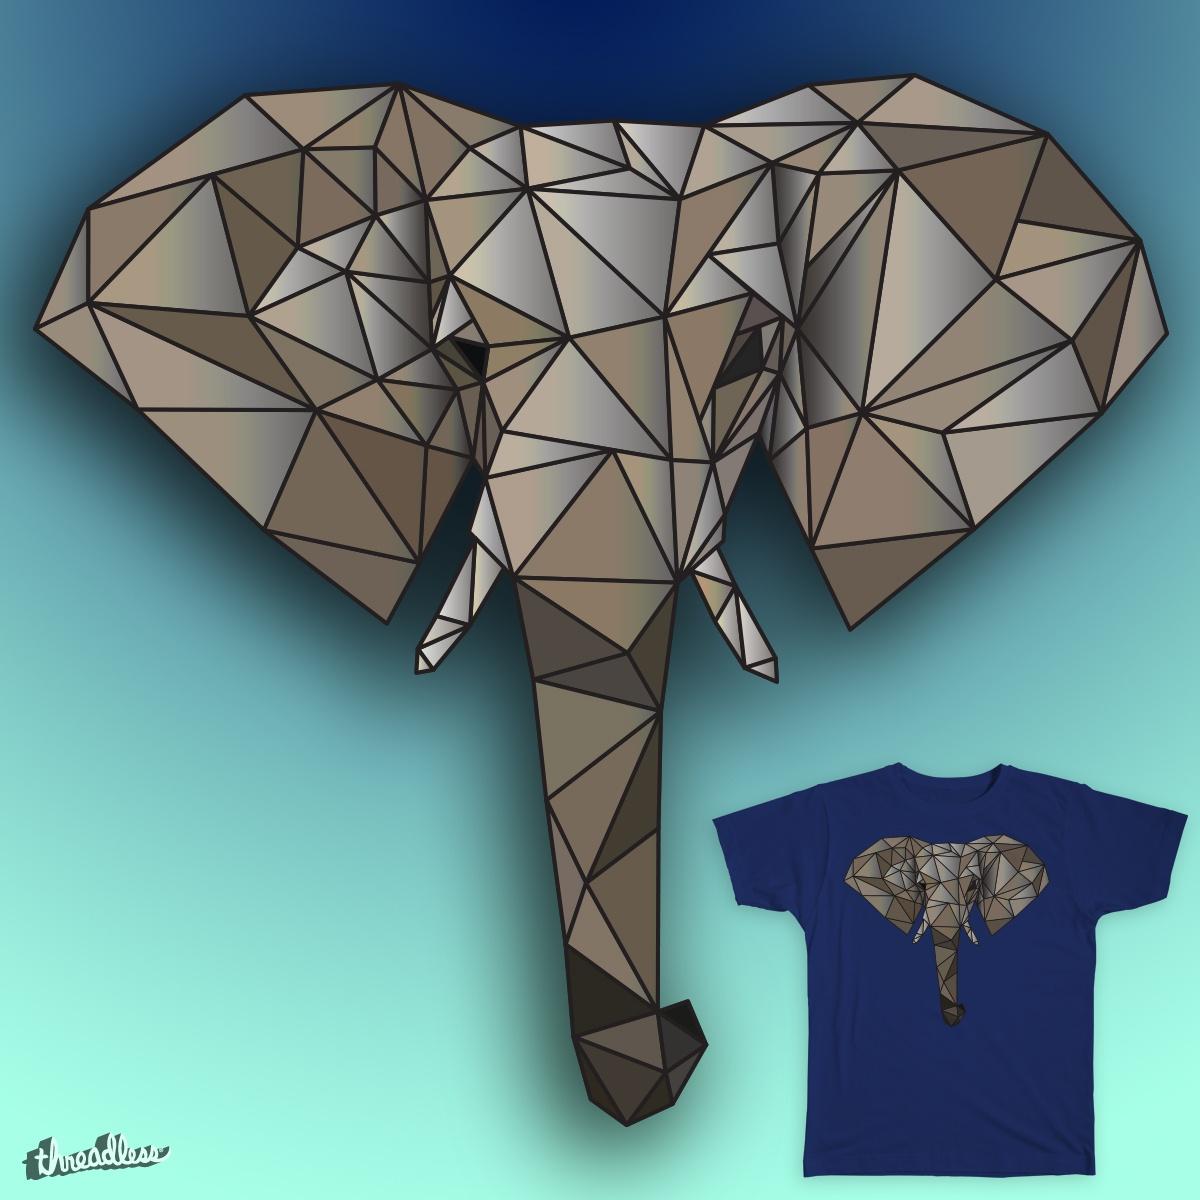 Geometric Elephant by themattdesign on Threadless